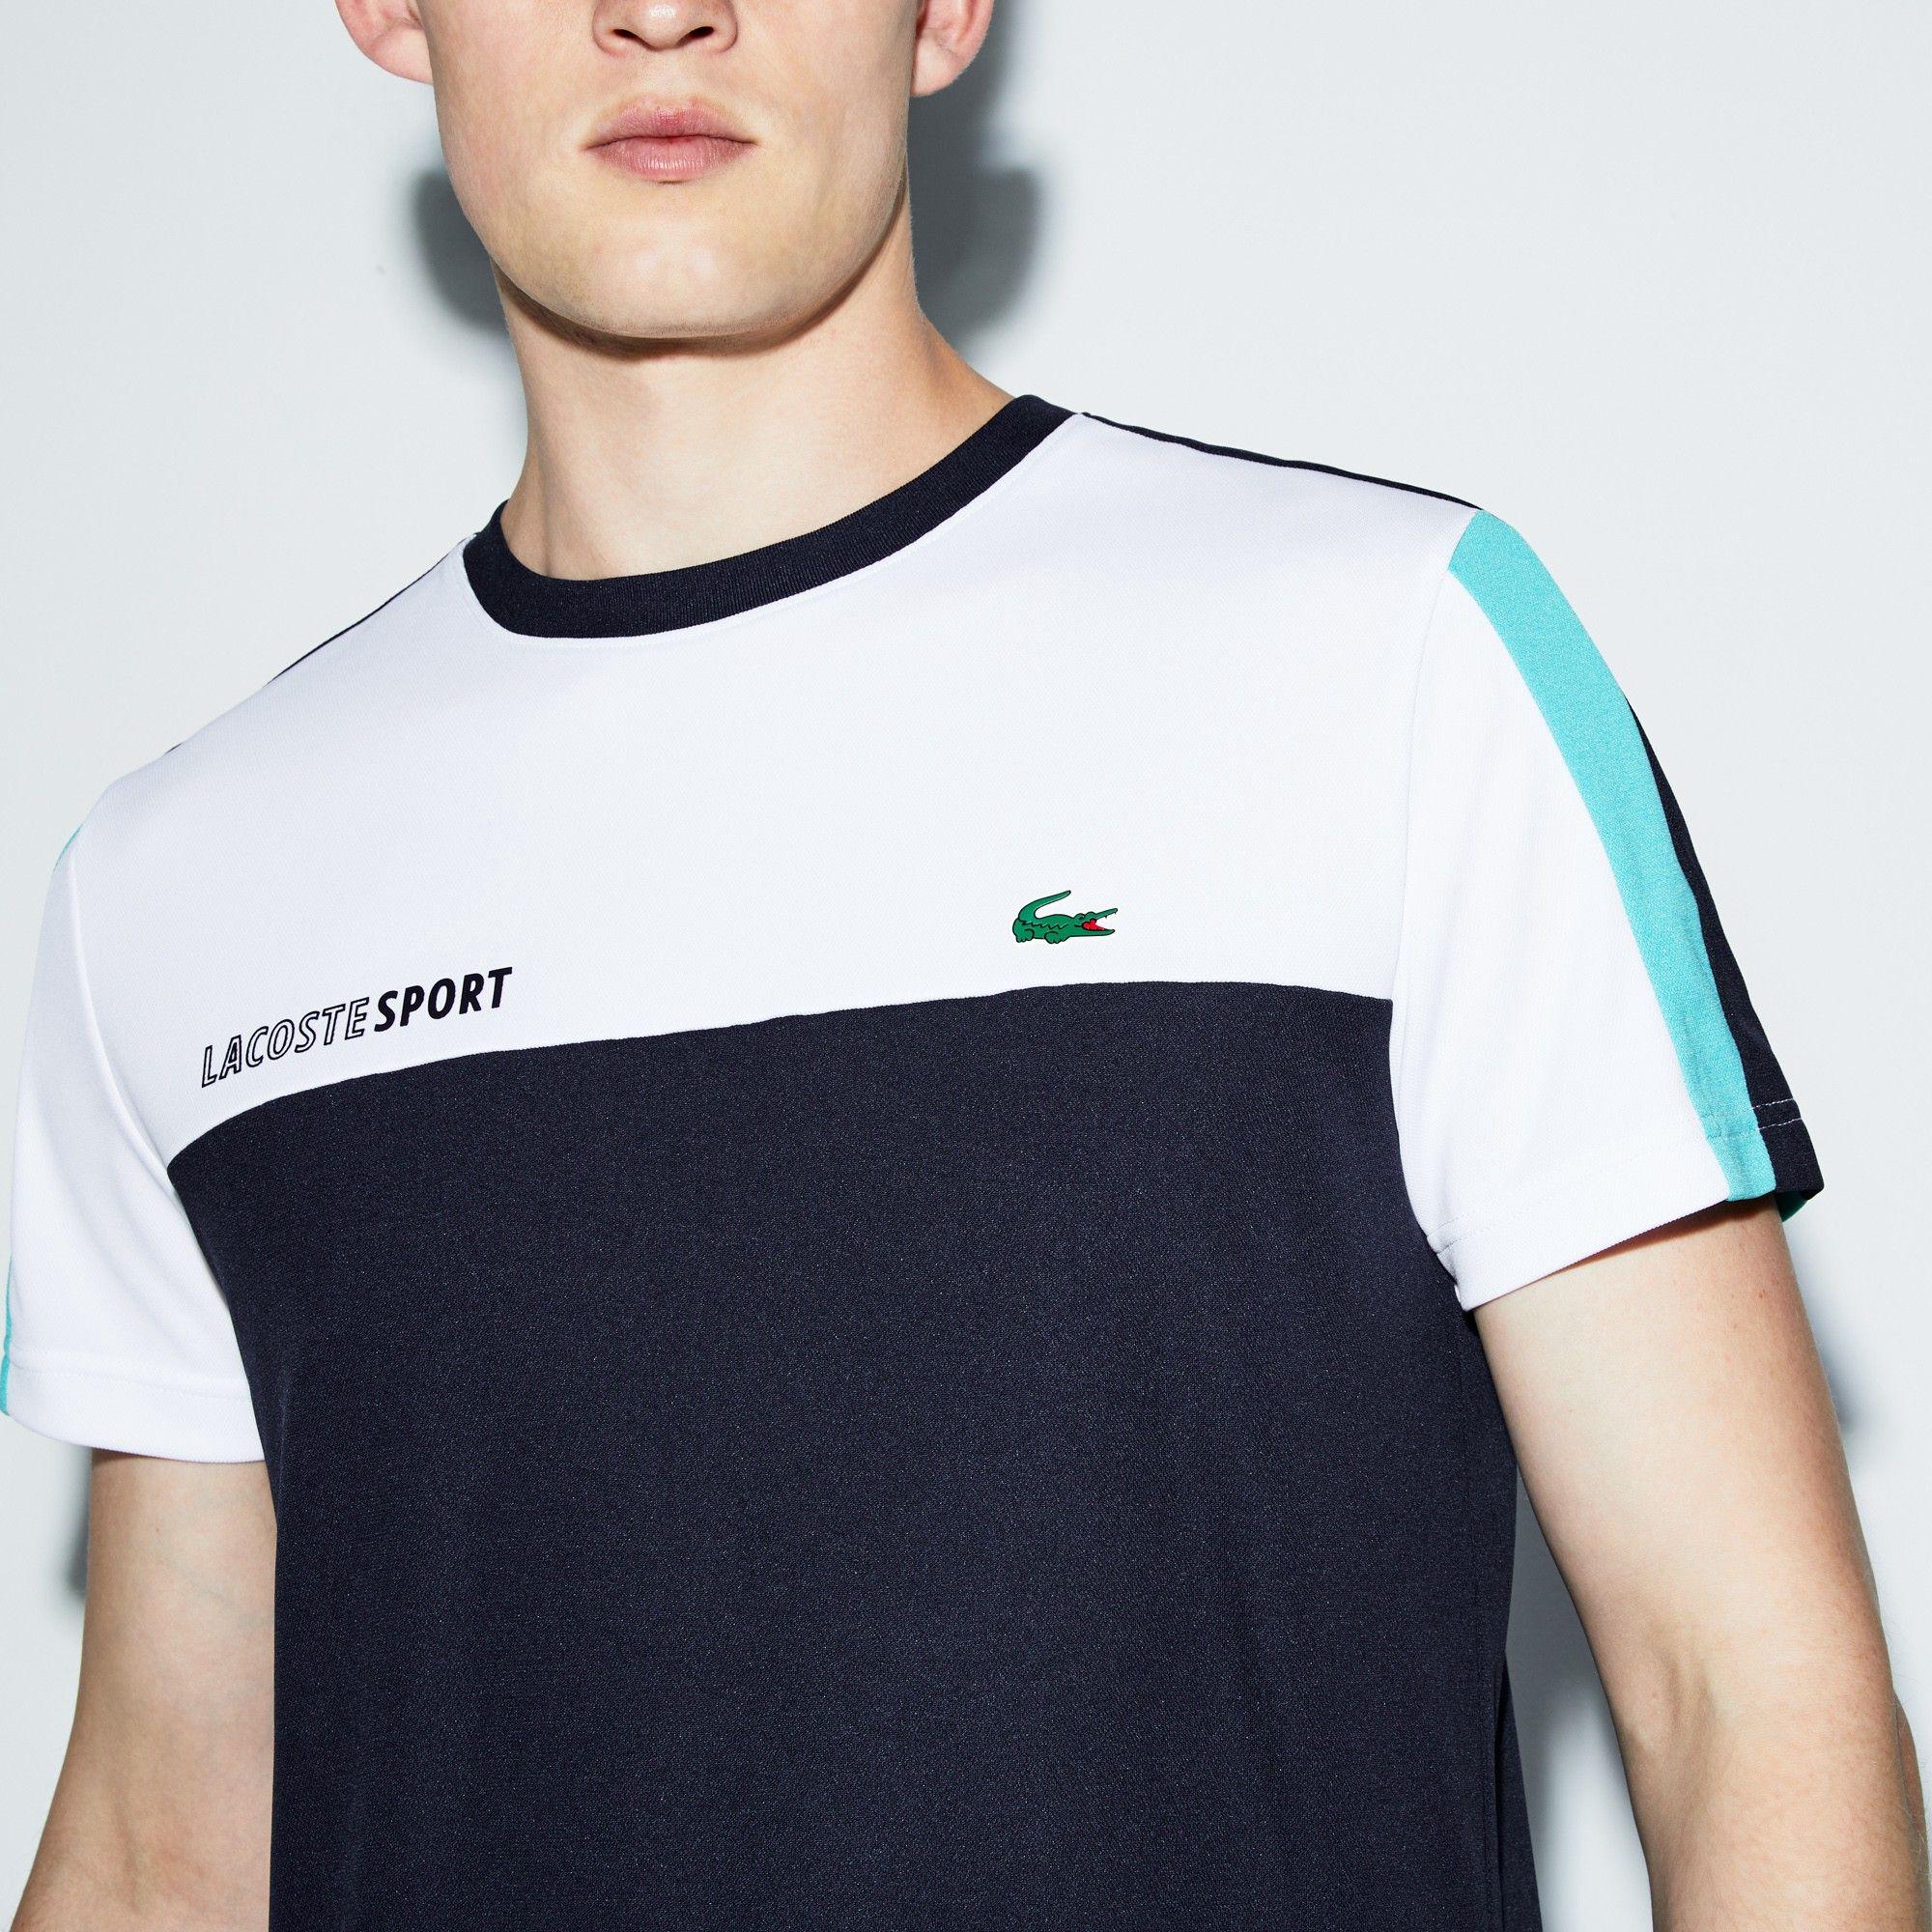 9ba759b0 Lacoste Men's Sport Crew Neck Colorblock Piqué Tennis T-Shirt -  Inkwell/Black-White Xxl Green